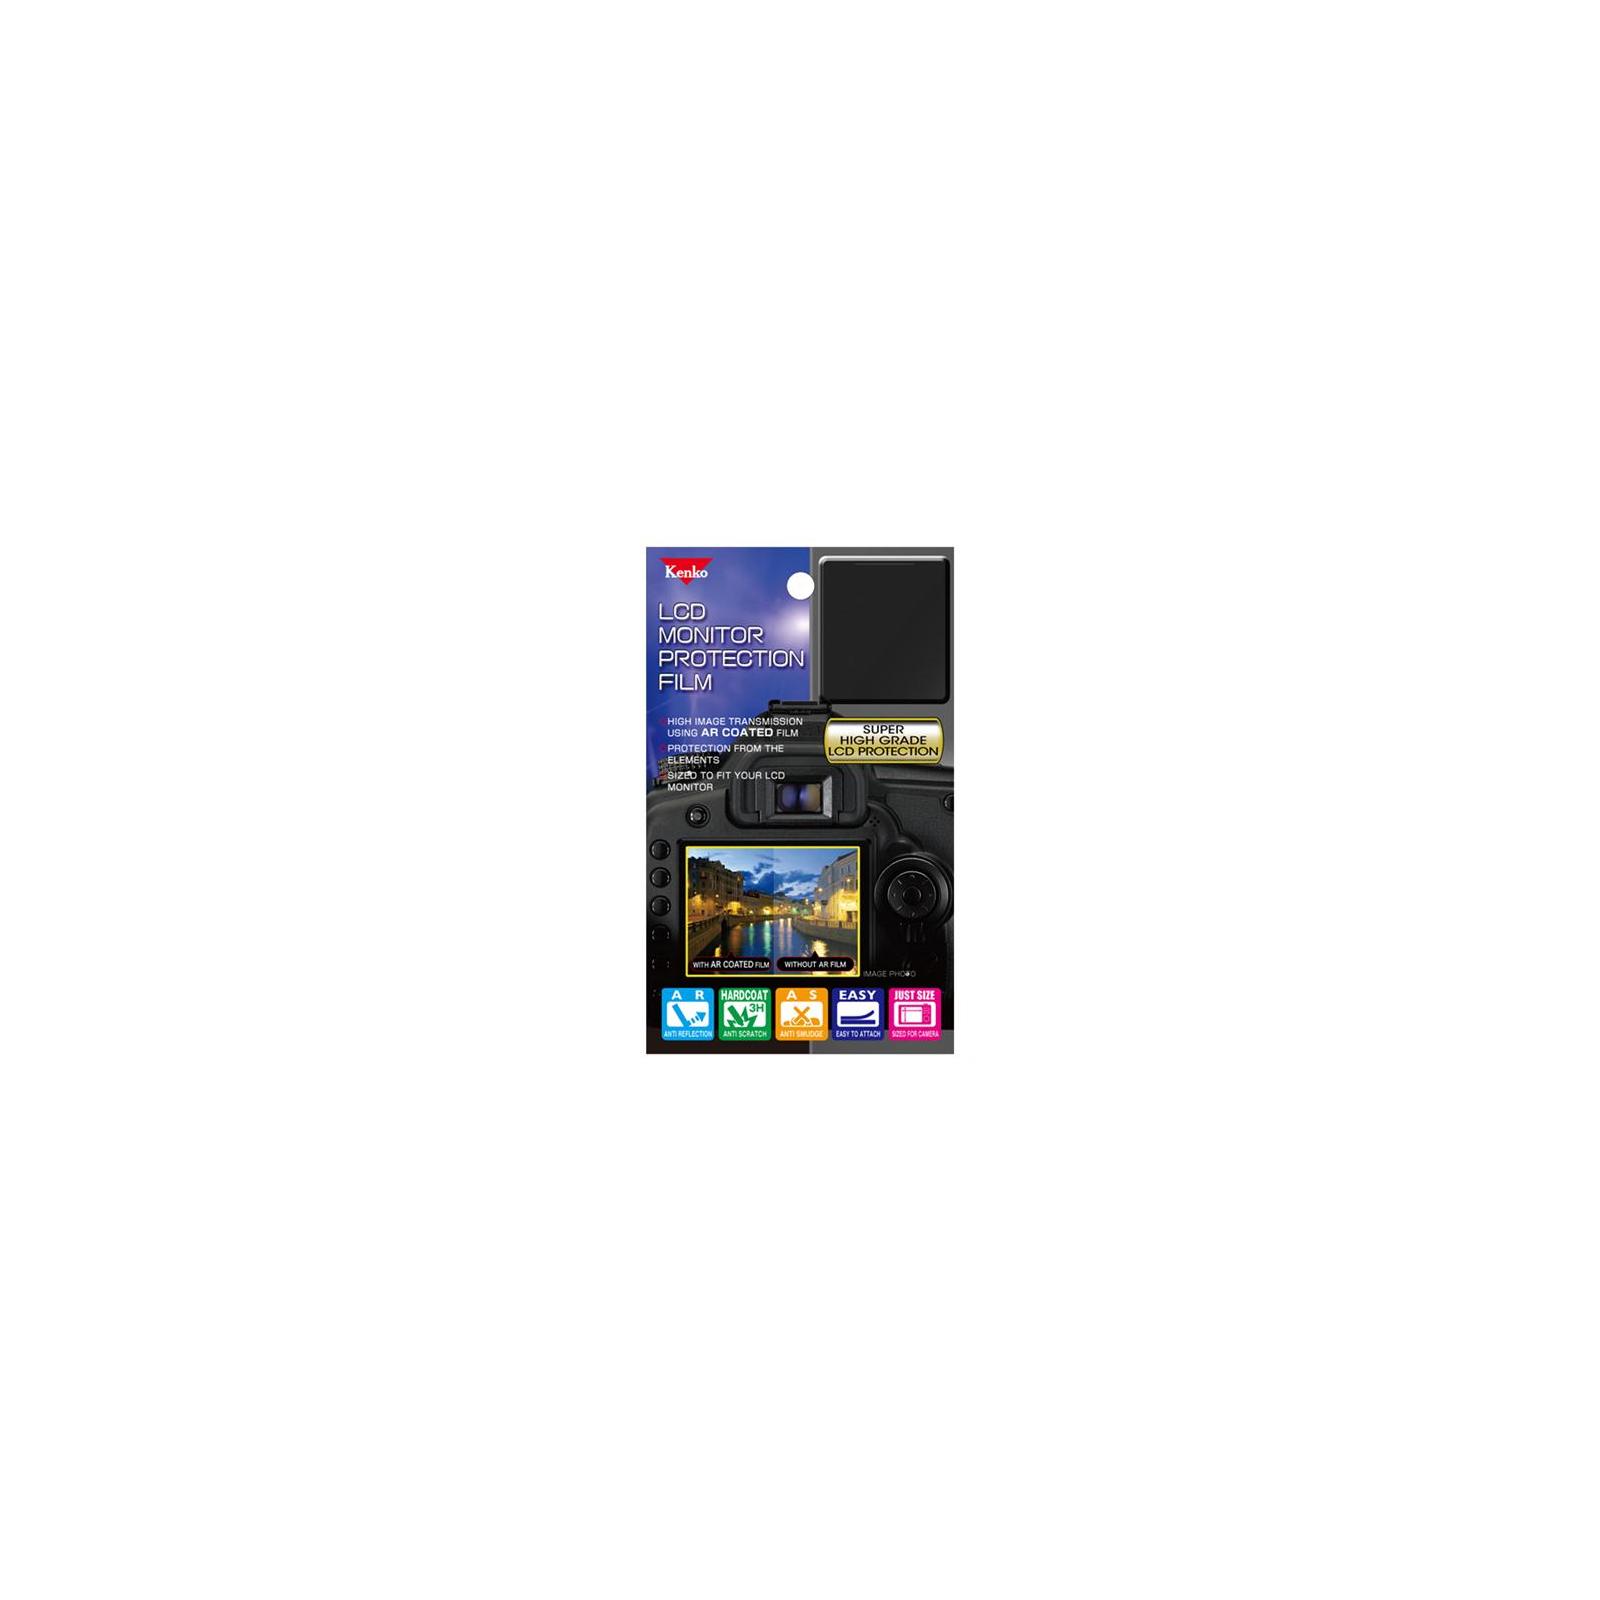 "Пленка защитная Kenko LCD protect film 2.7"" (085215)"